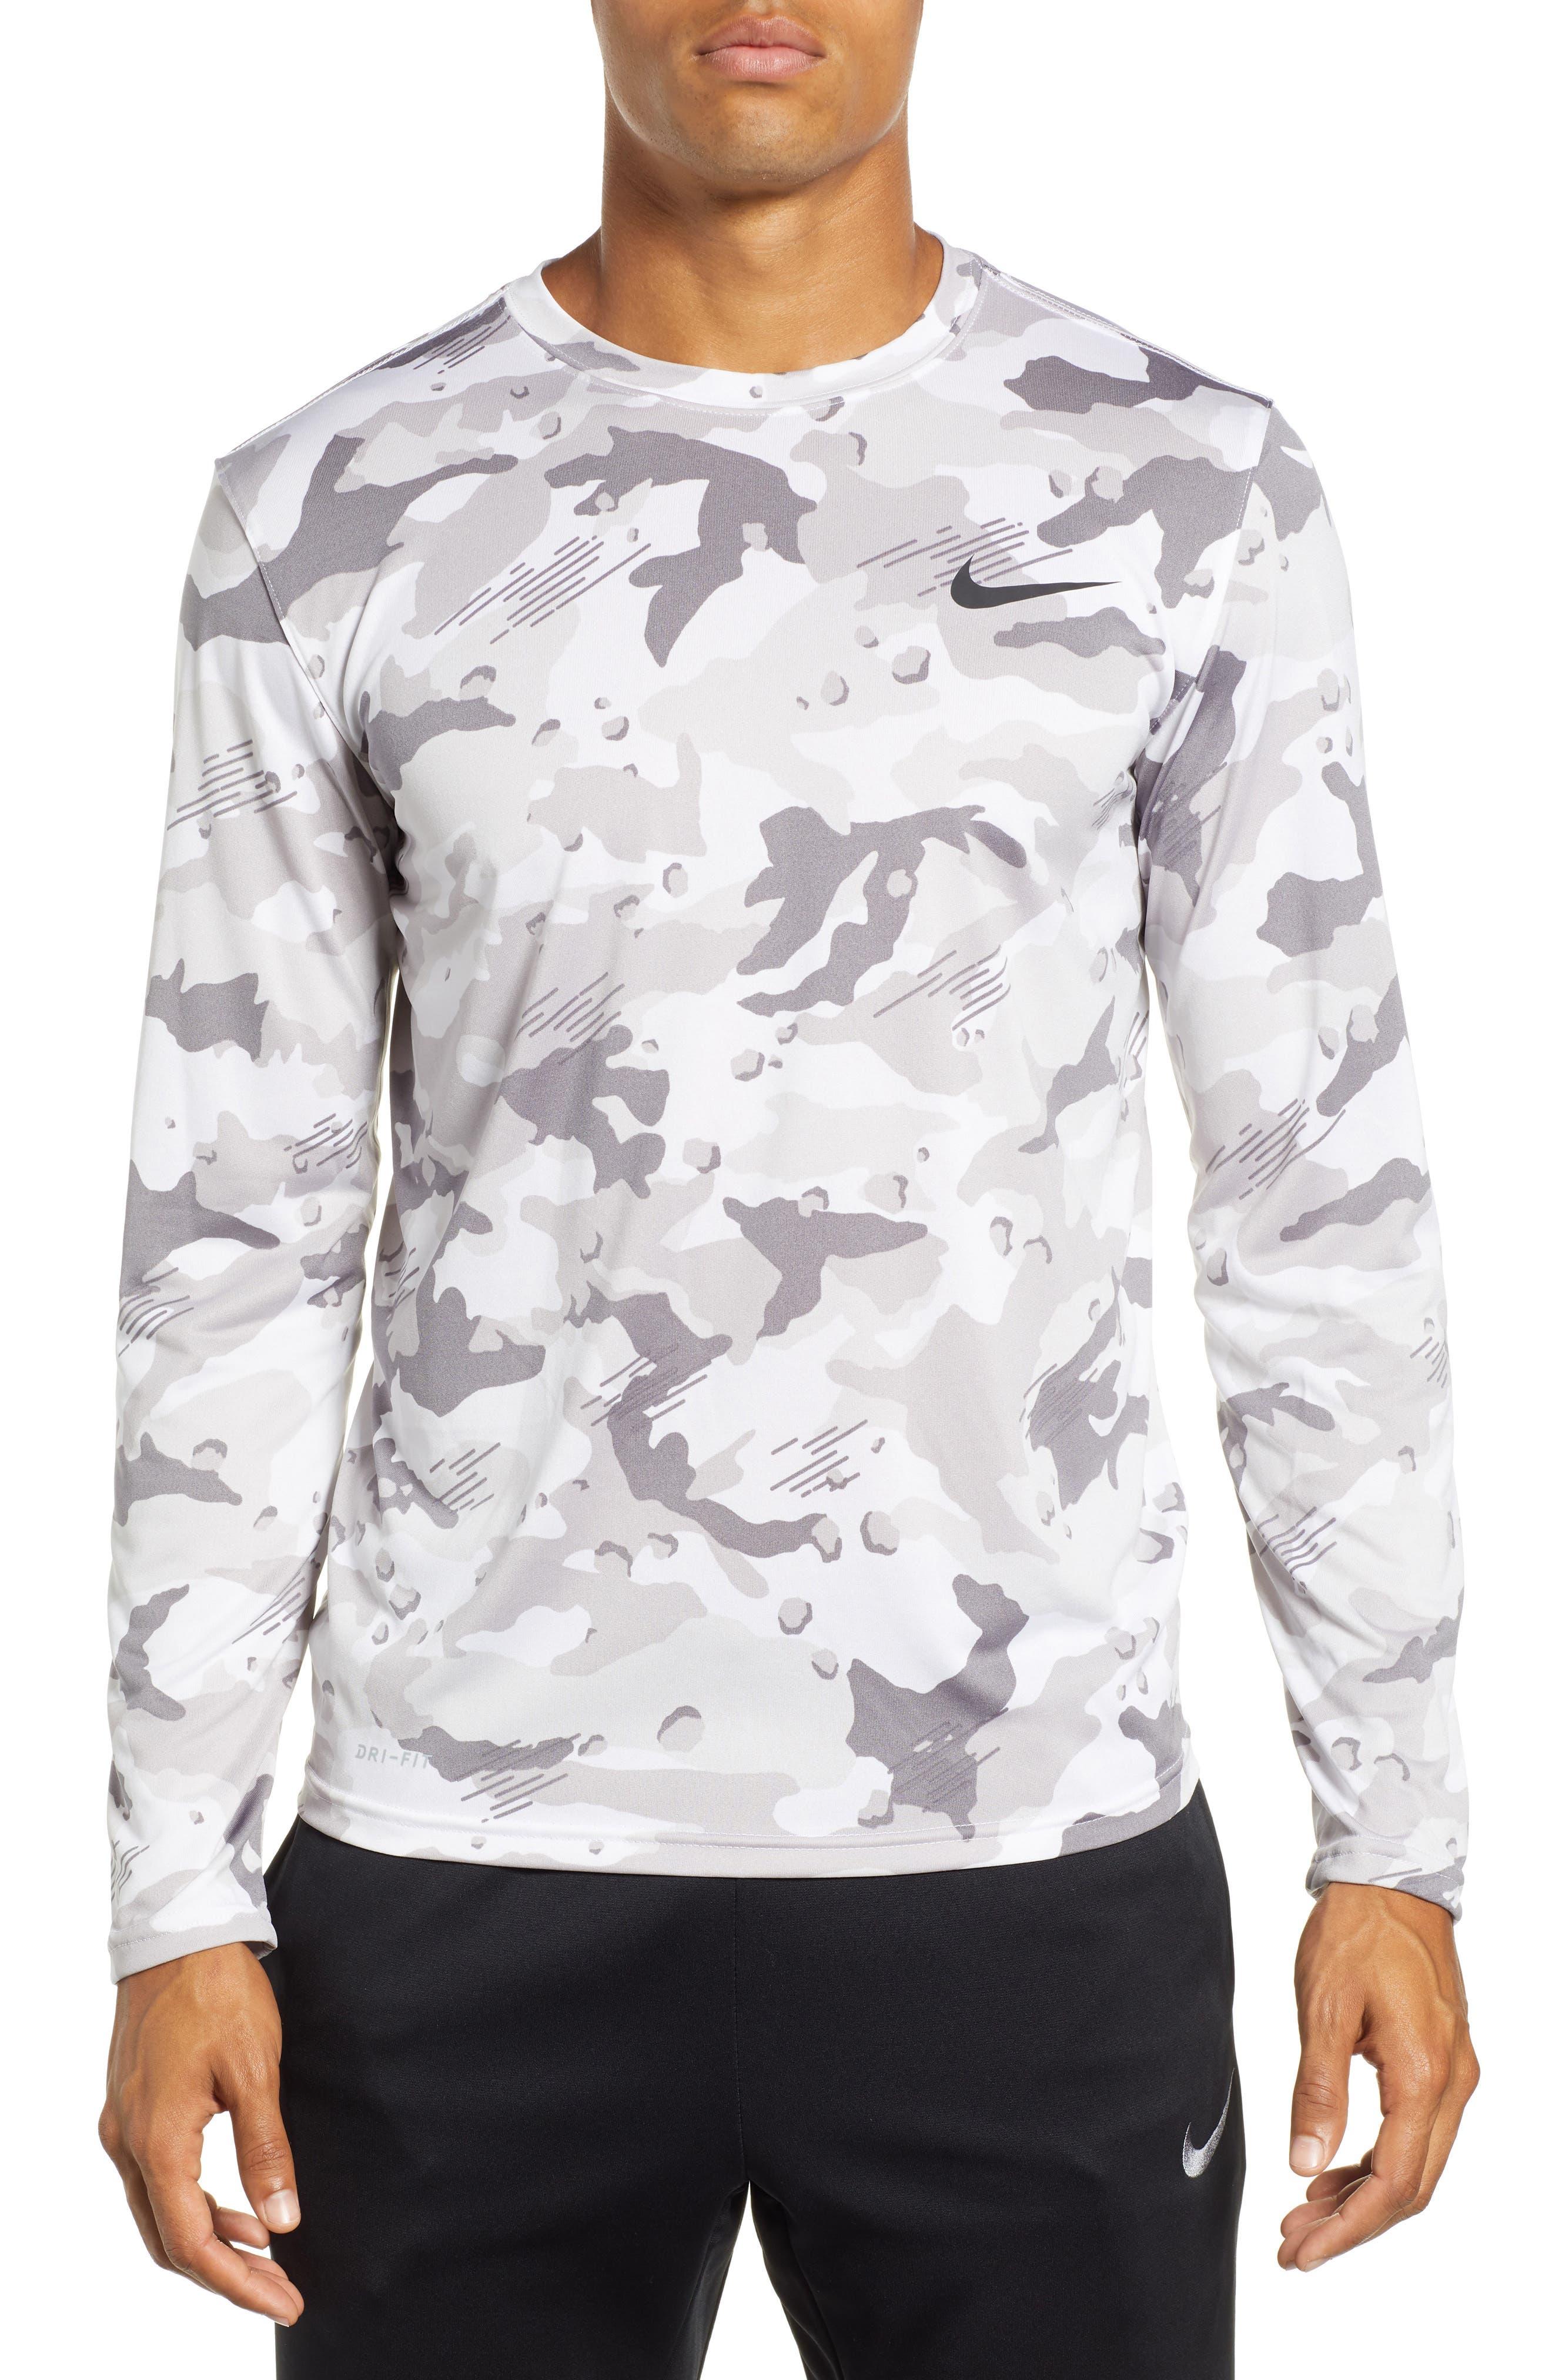 Nike Dry Long Sleeve Camo T-Shirt White